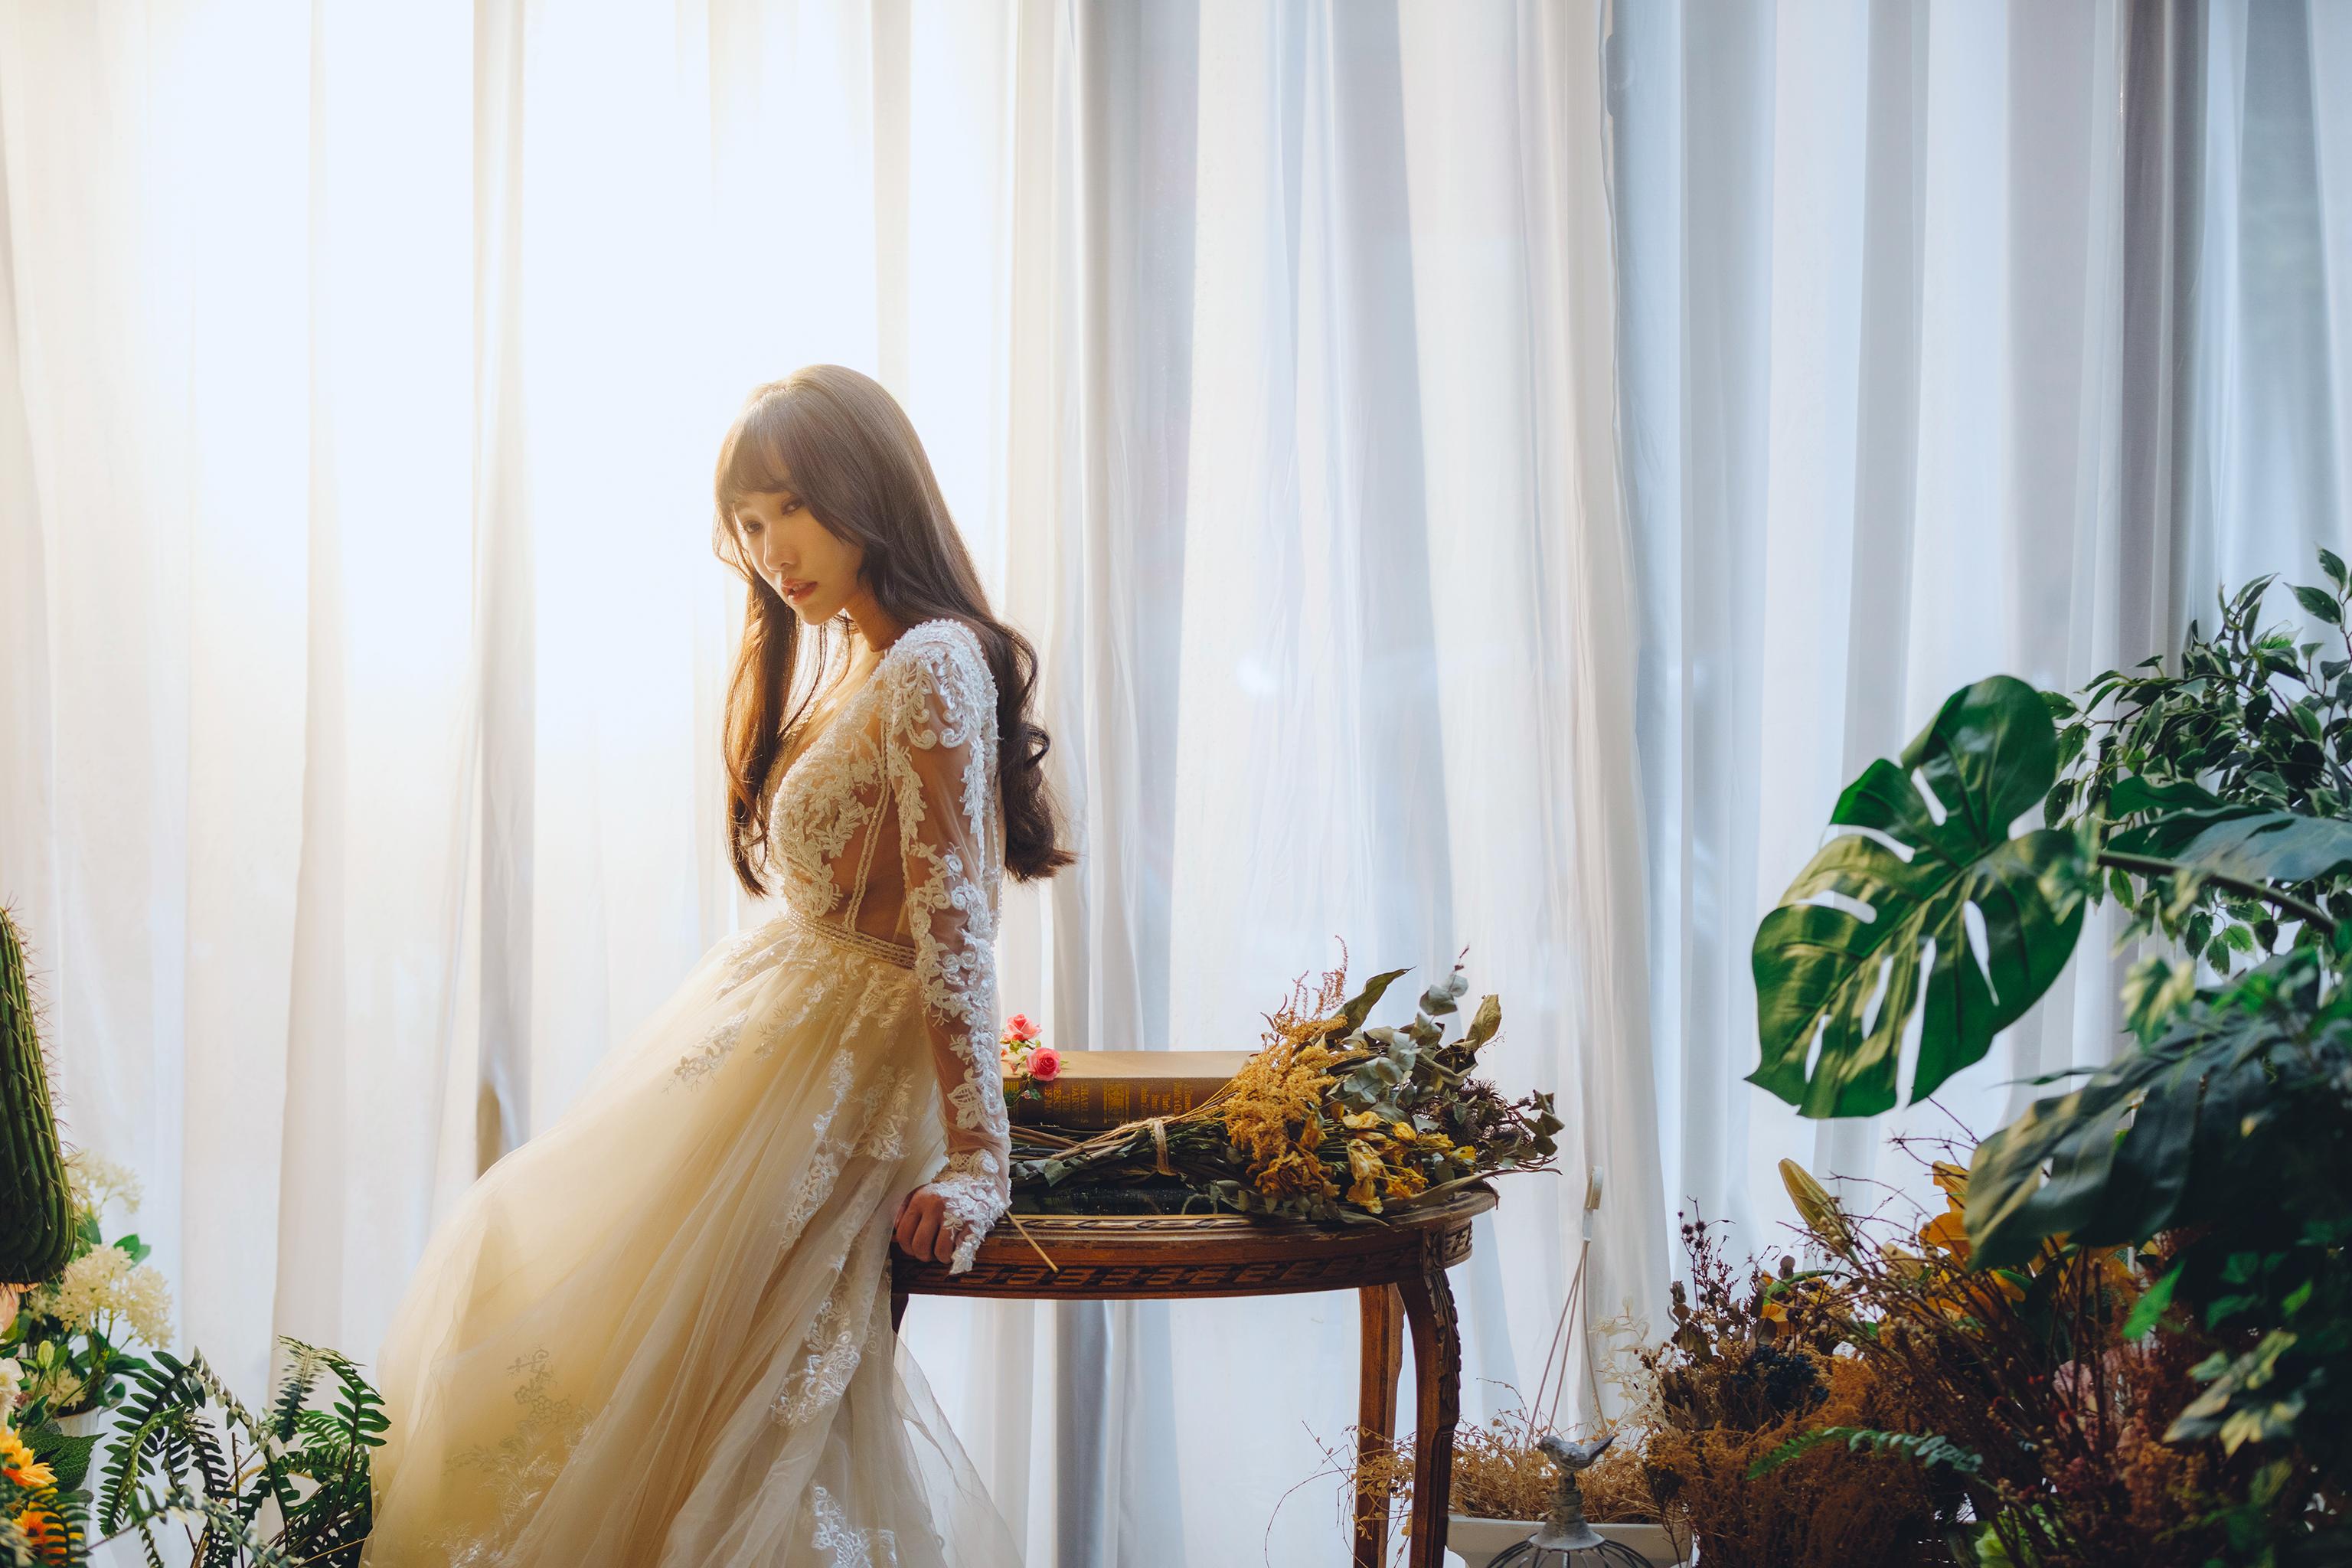 48837711973 29debb88aa o - 【自主婚紗】+Yoyo+